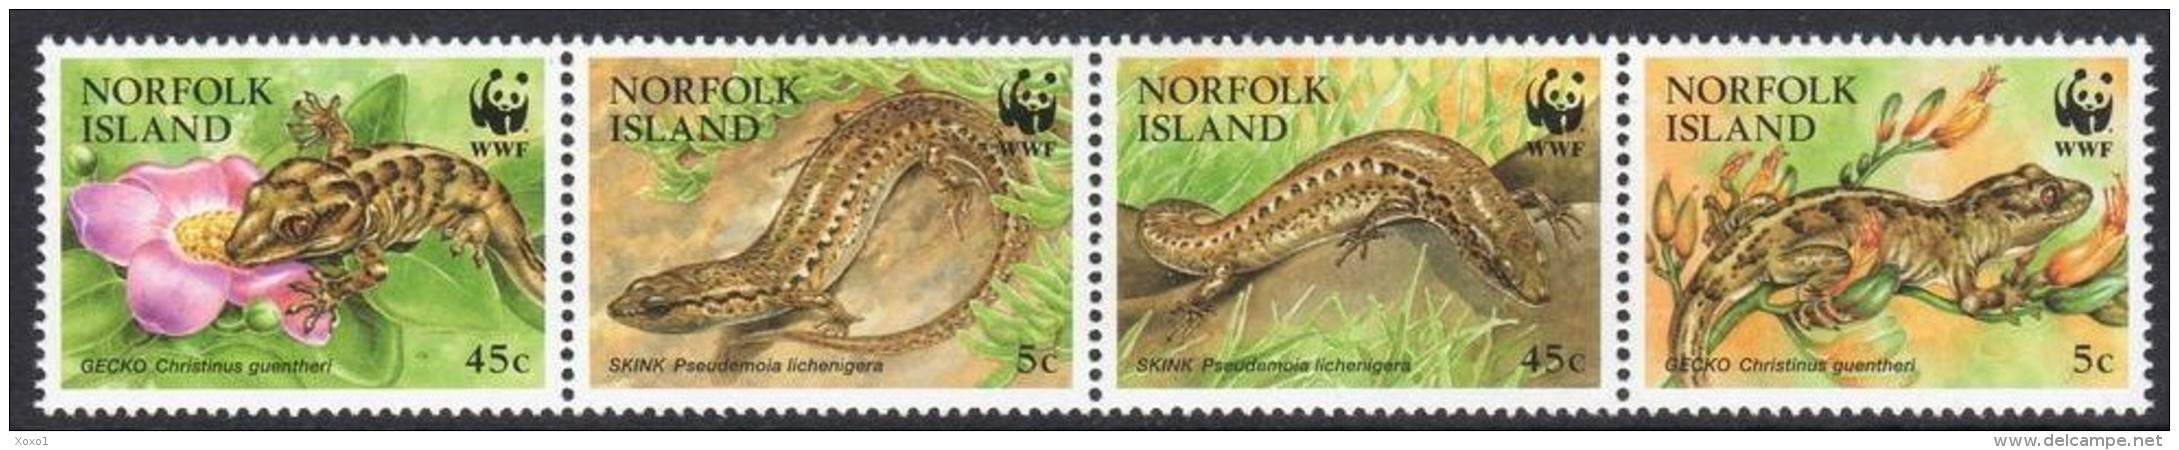 Norfolk 1996 WWF Reptiles 4v MNH** - W.W.F.